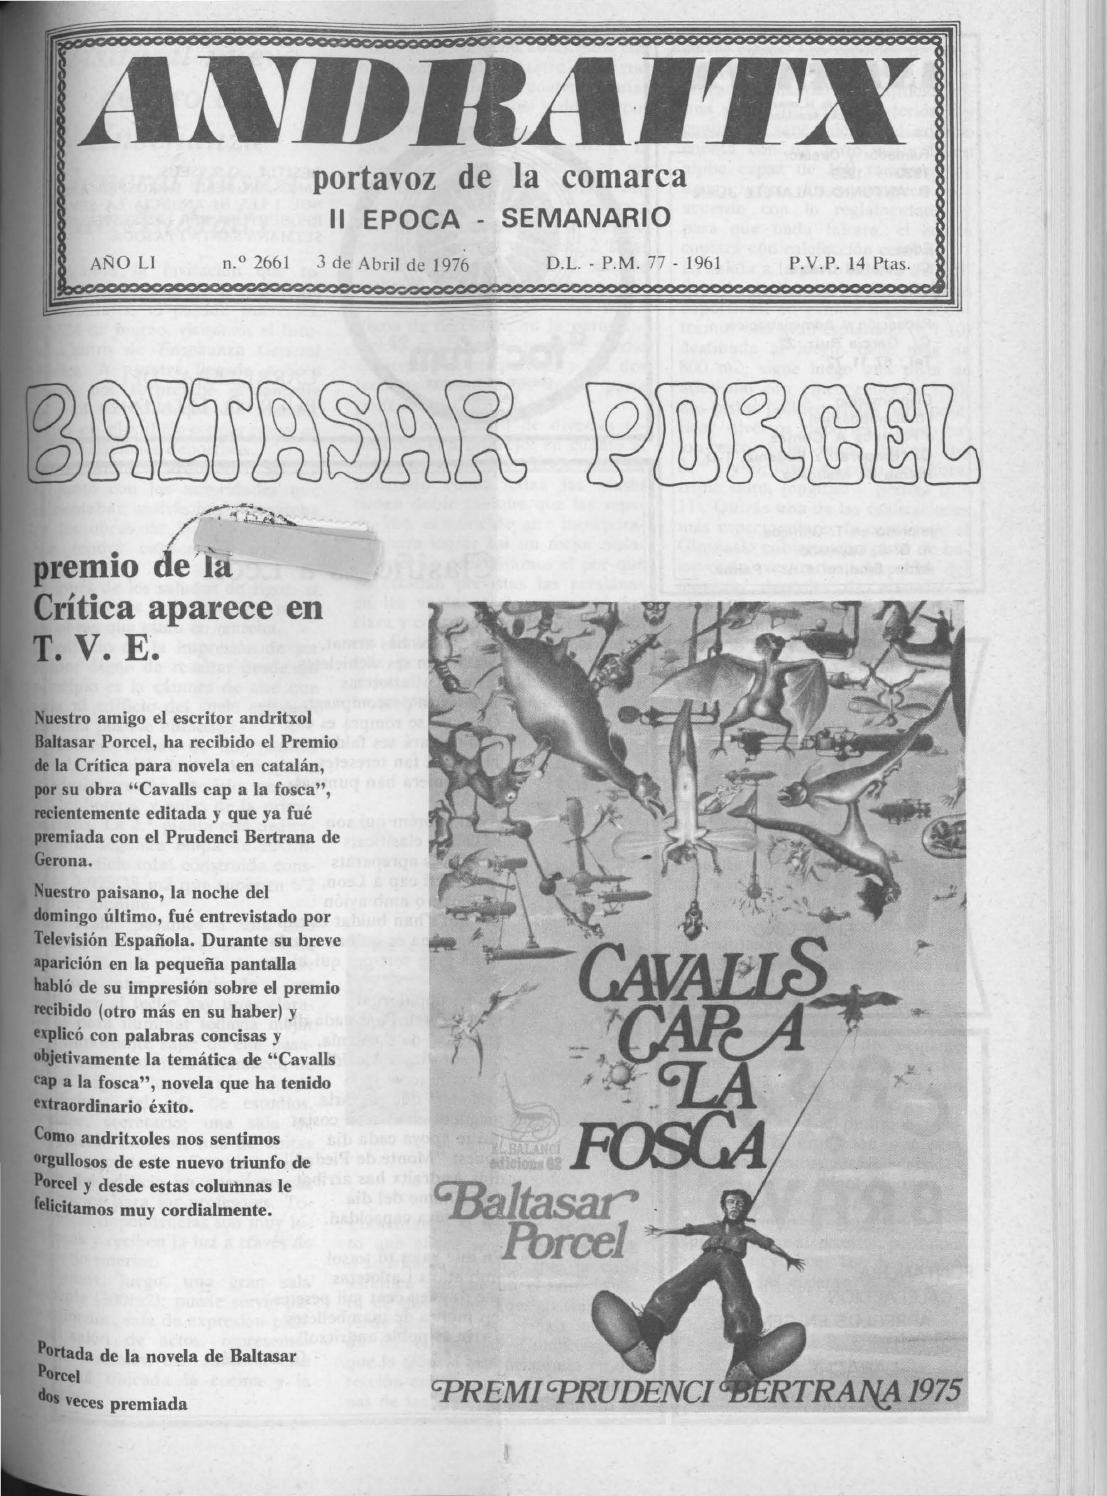 Andraitx abril 1976 by Biblioteca Municipal d\'Andratx - issuu